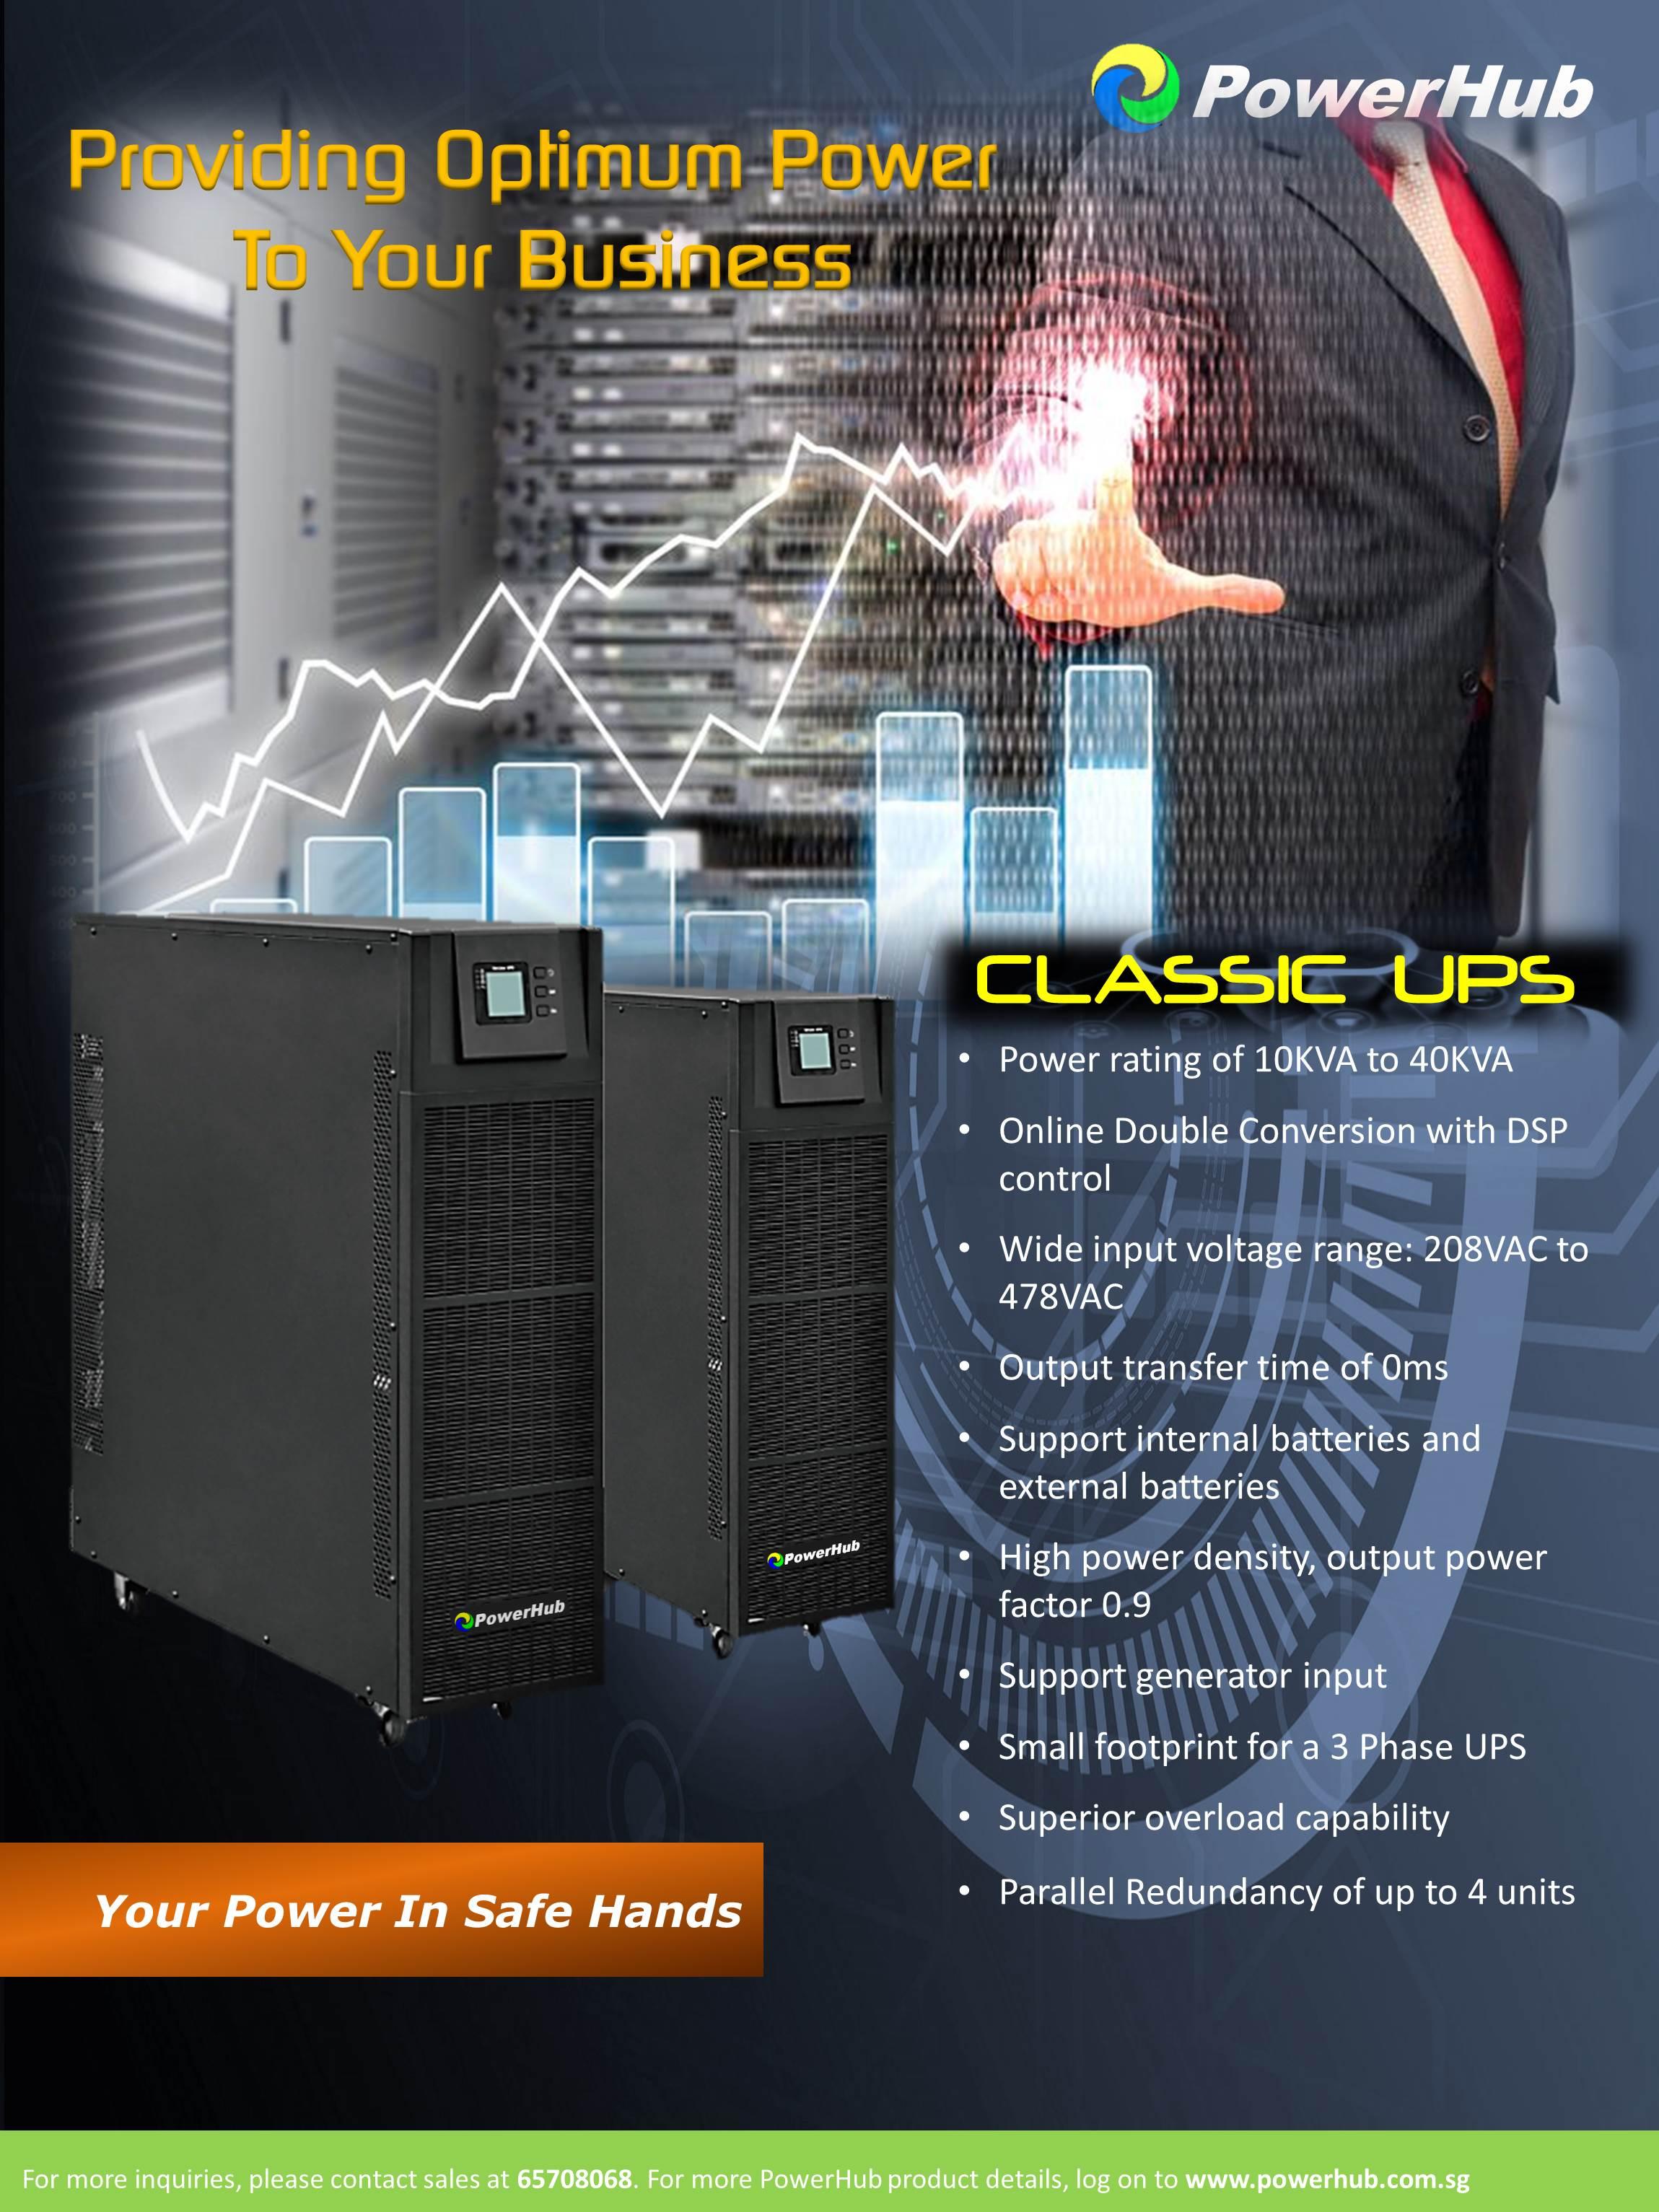 CLASSIC UPS